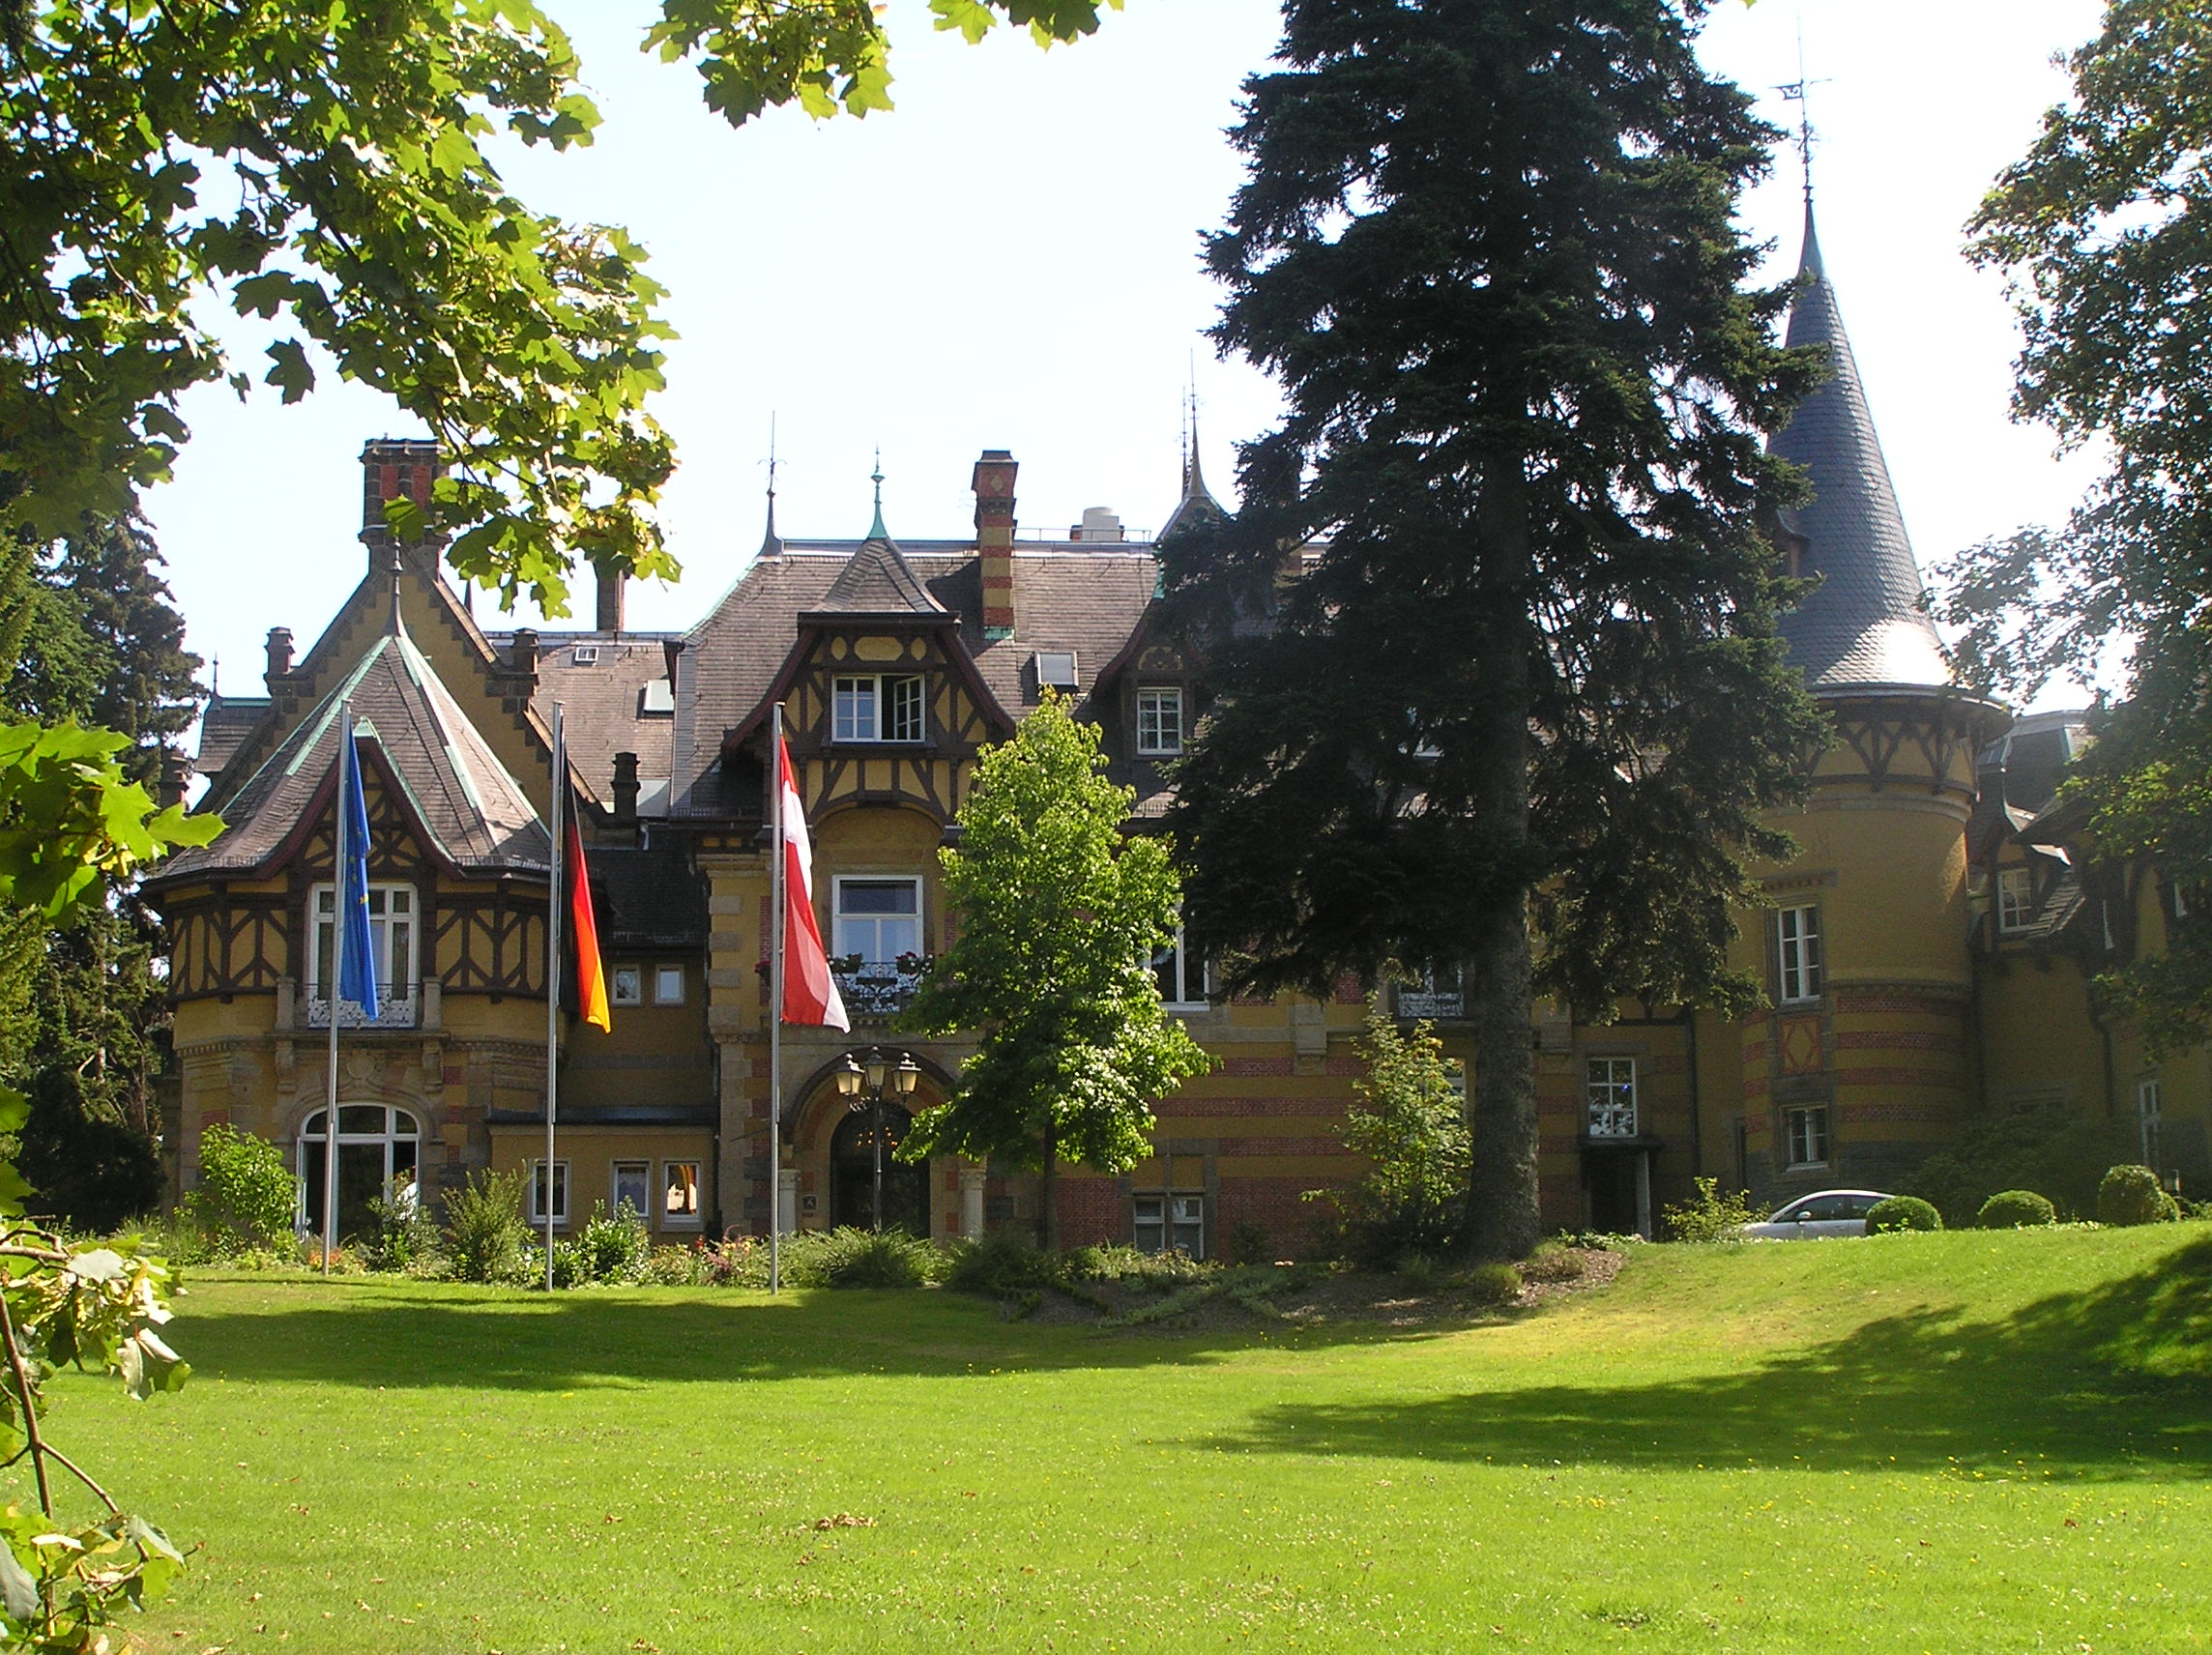 Villa Falkenstein villa rothschild kempinski frankfurt кёнигштайн таунус